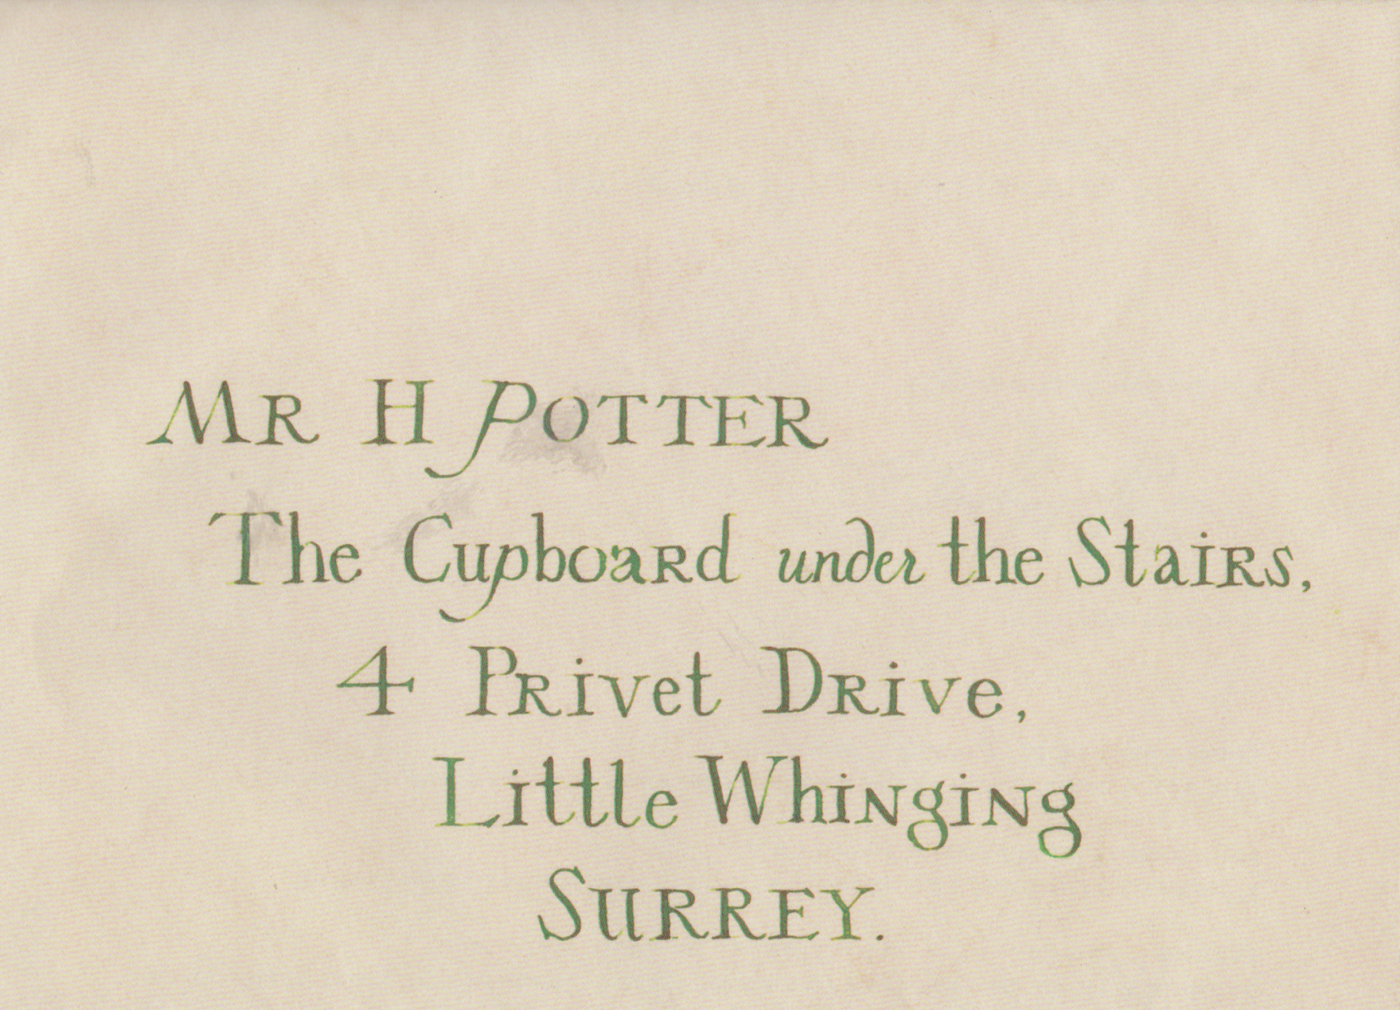 Mr H. Potter (HP Film Wizardry extra)